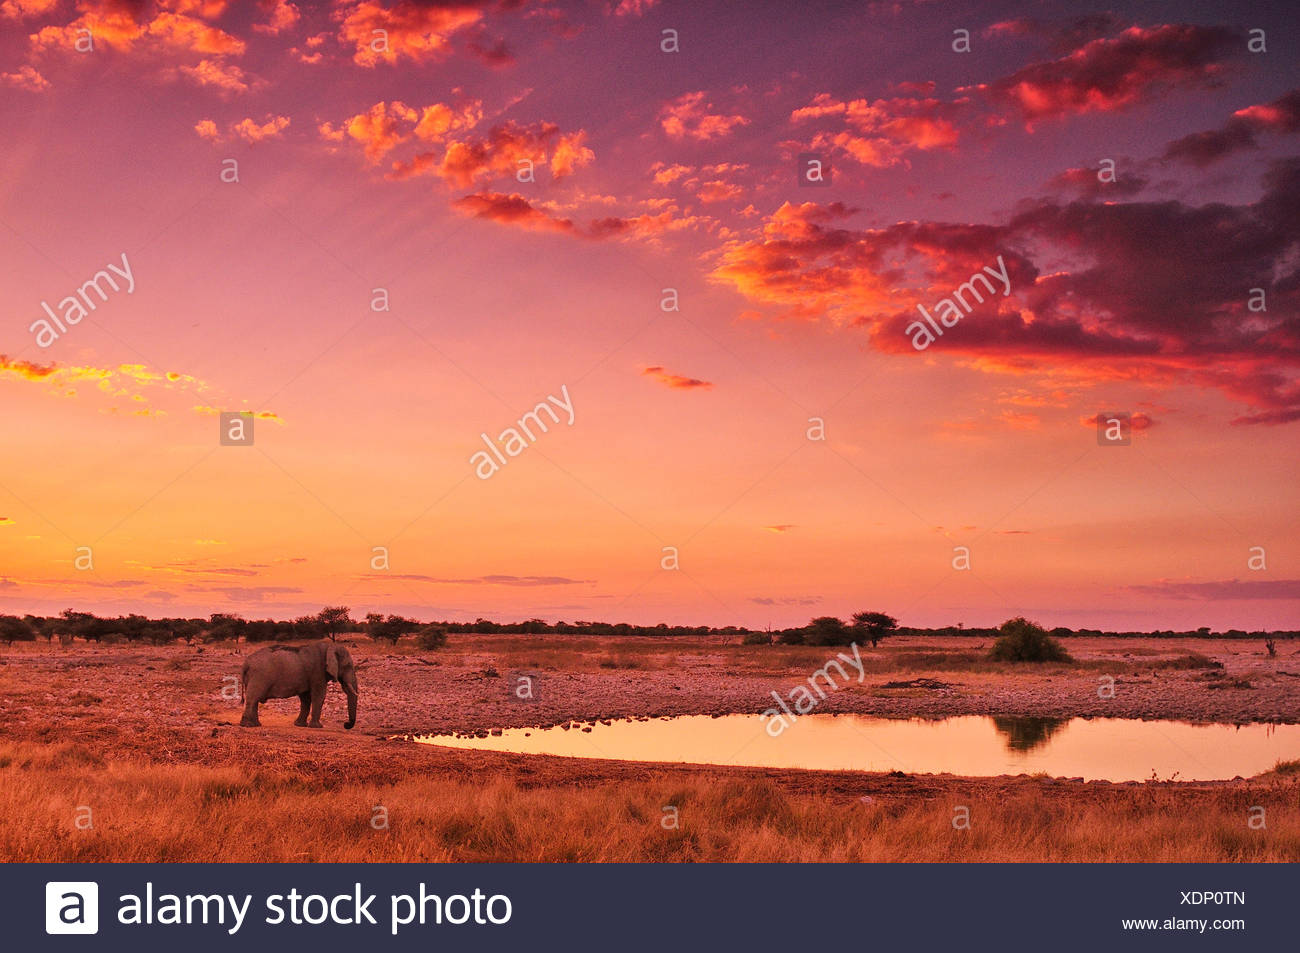 Africa, Namibia, Etosha National Park, tramonto, elefante, animale, waterhole, safari, animali selvatici, rosso, Loxodonta africana, una Immagini Stock